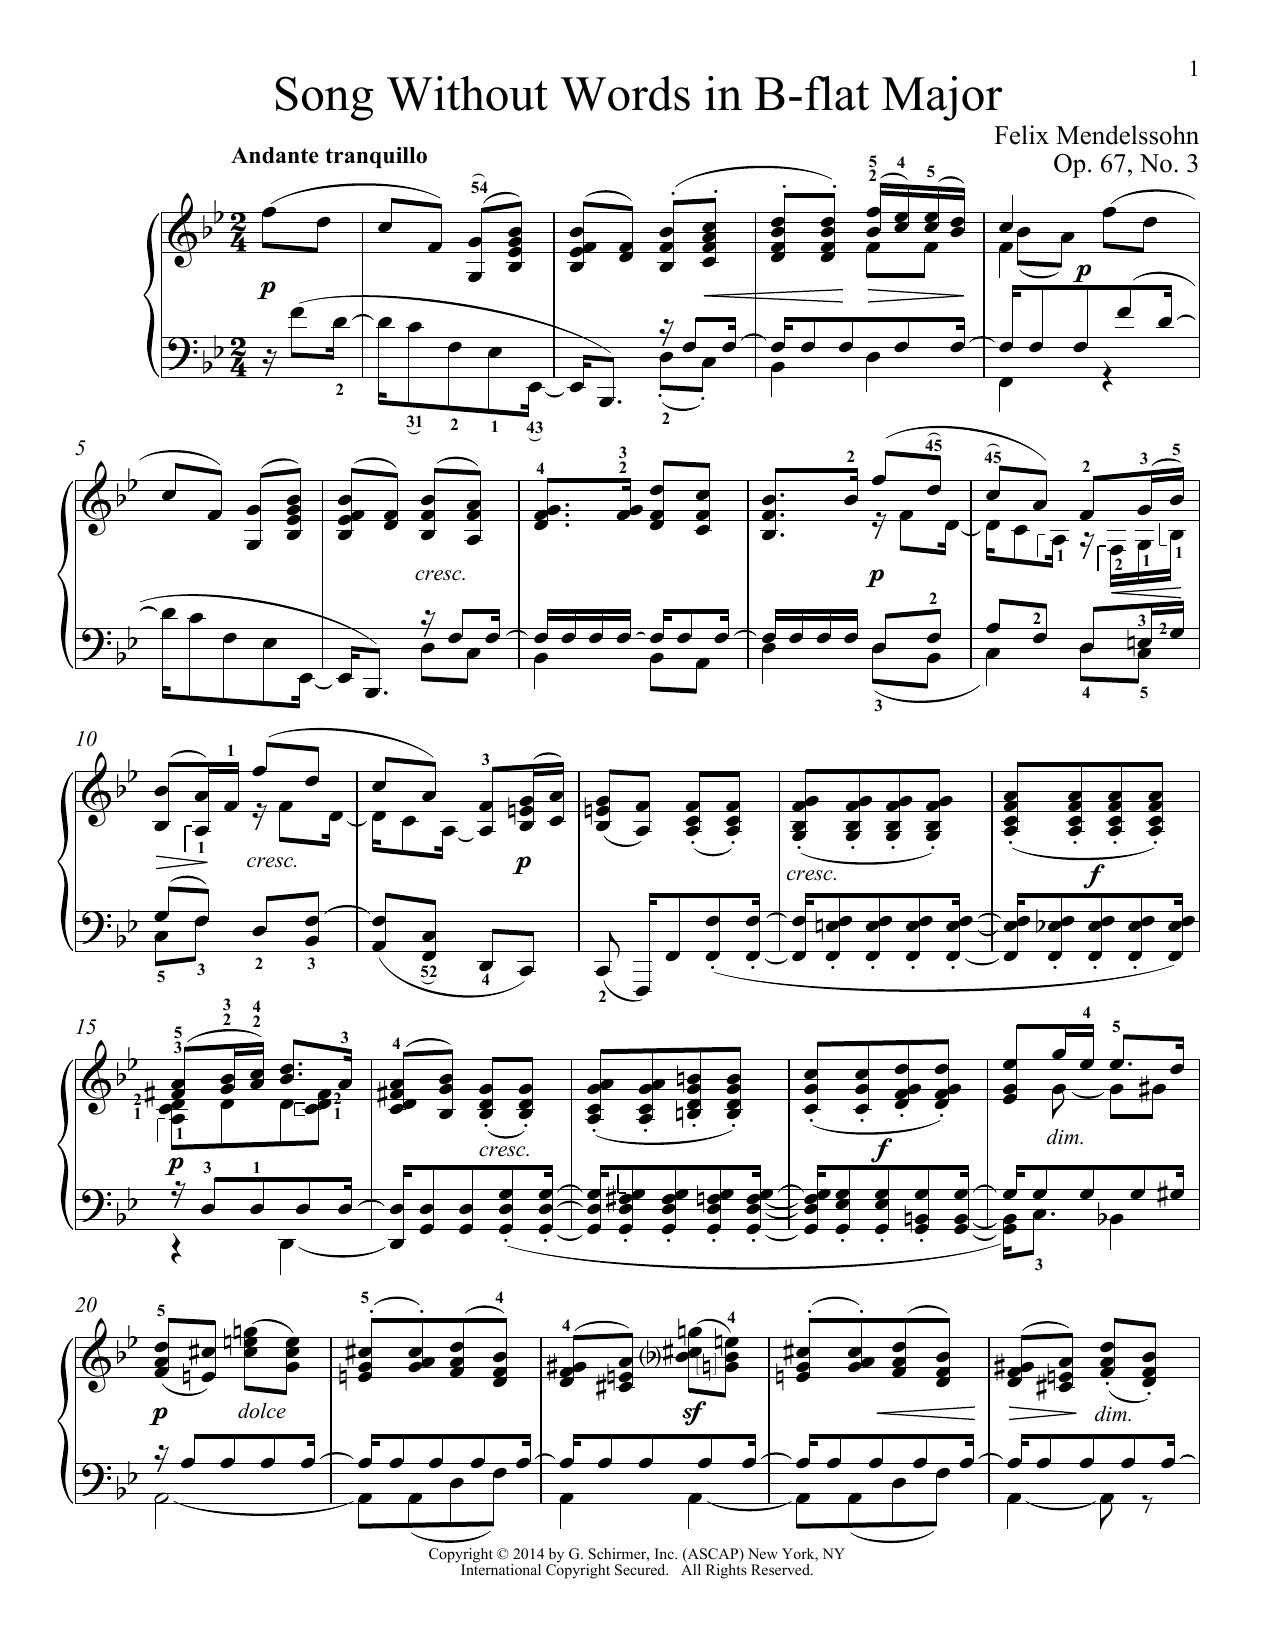 Partition piano Song Without Words In B-Flat Major, Op. 67, No. 3 de Felix Mendelssohn - Piano Solo